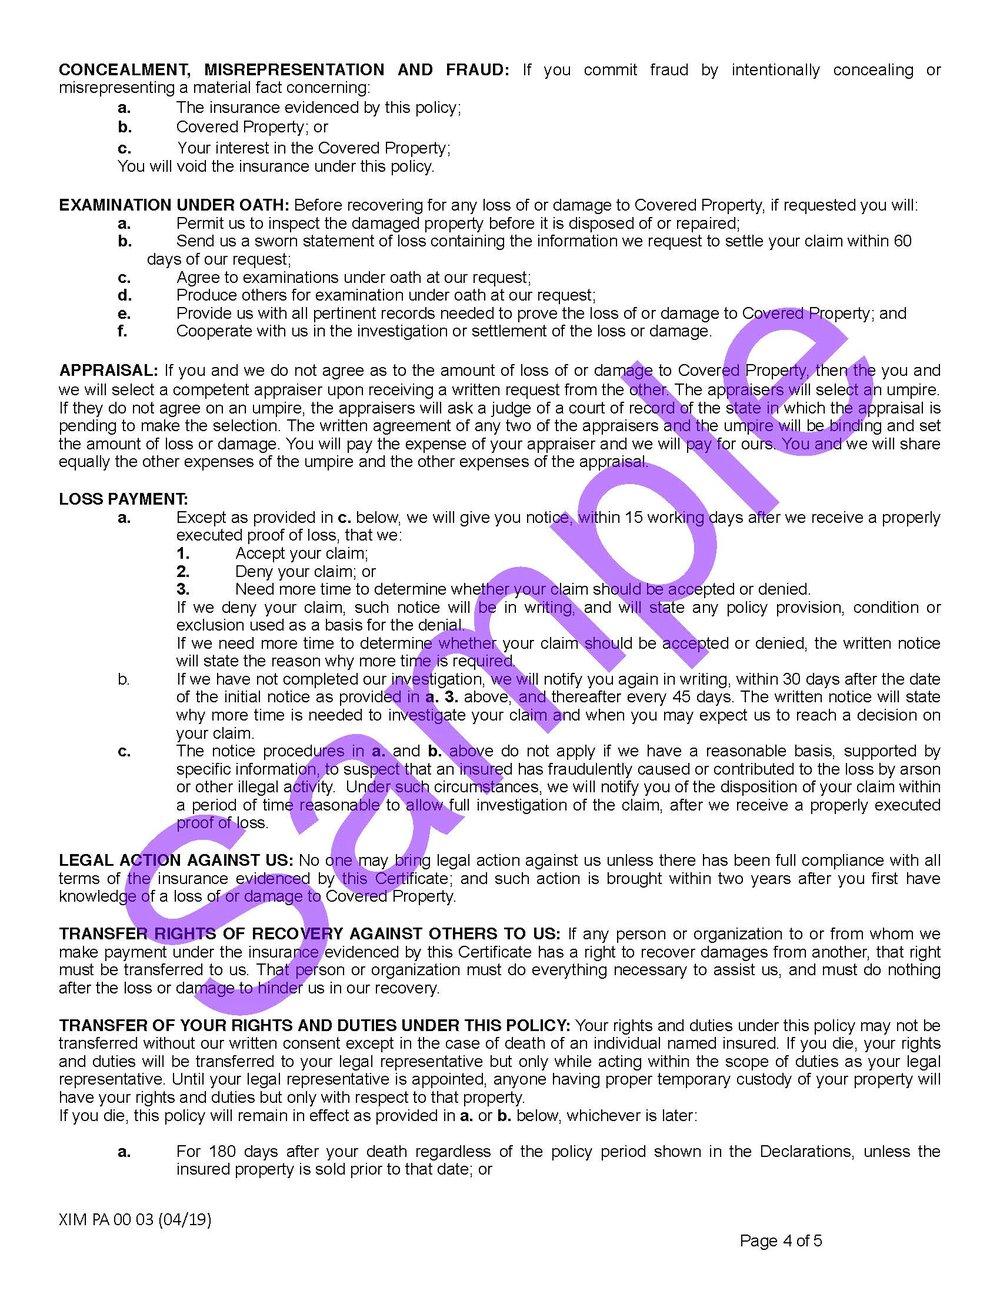 XIM PA 00 03 04 19 Pennsylvania Certificate of InsuranceSample_Page_4.jpg